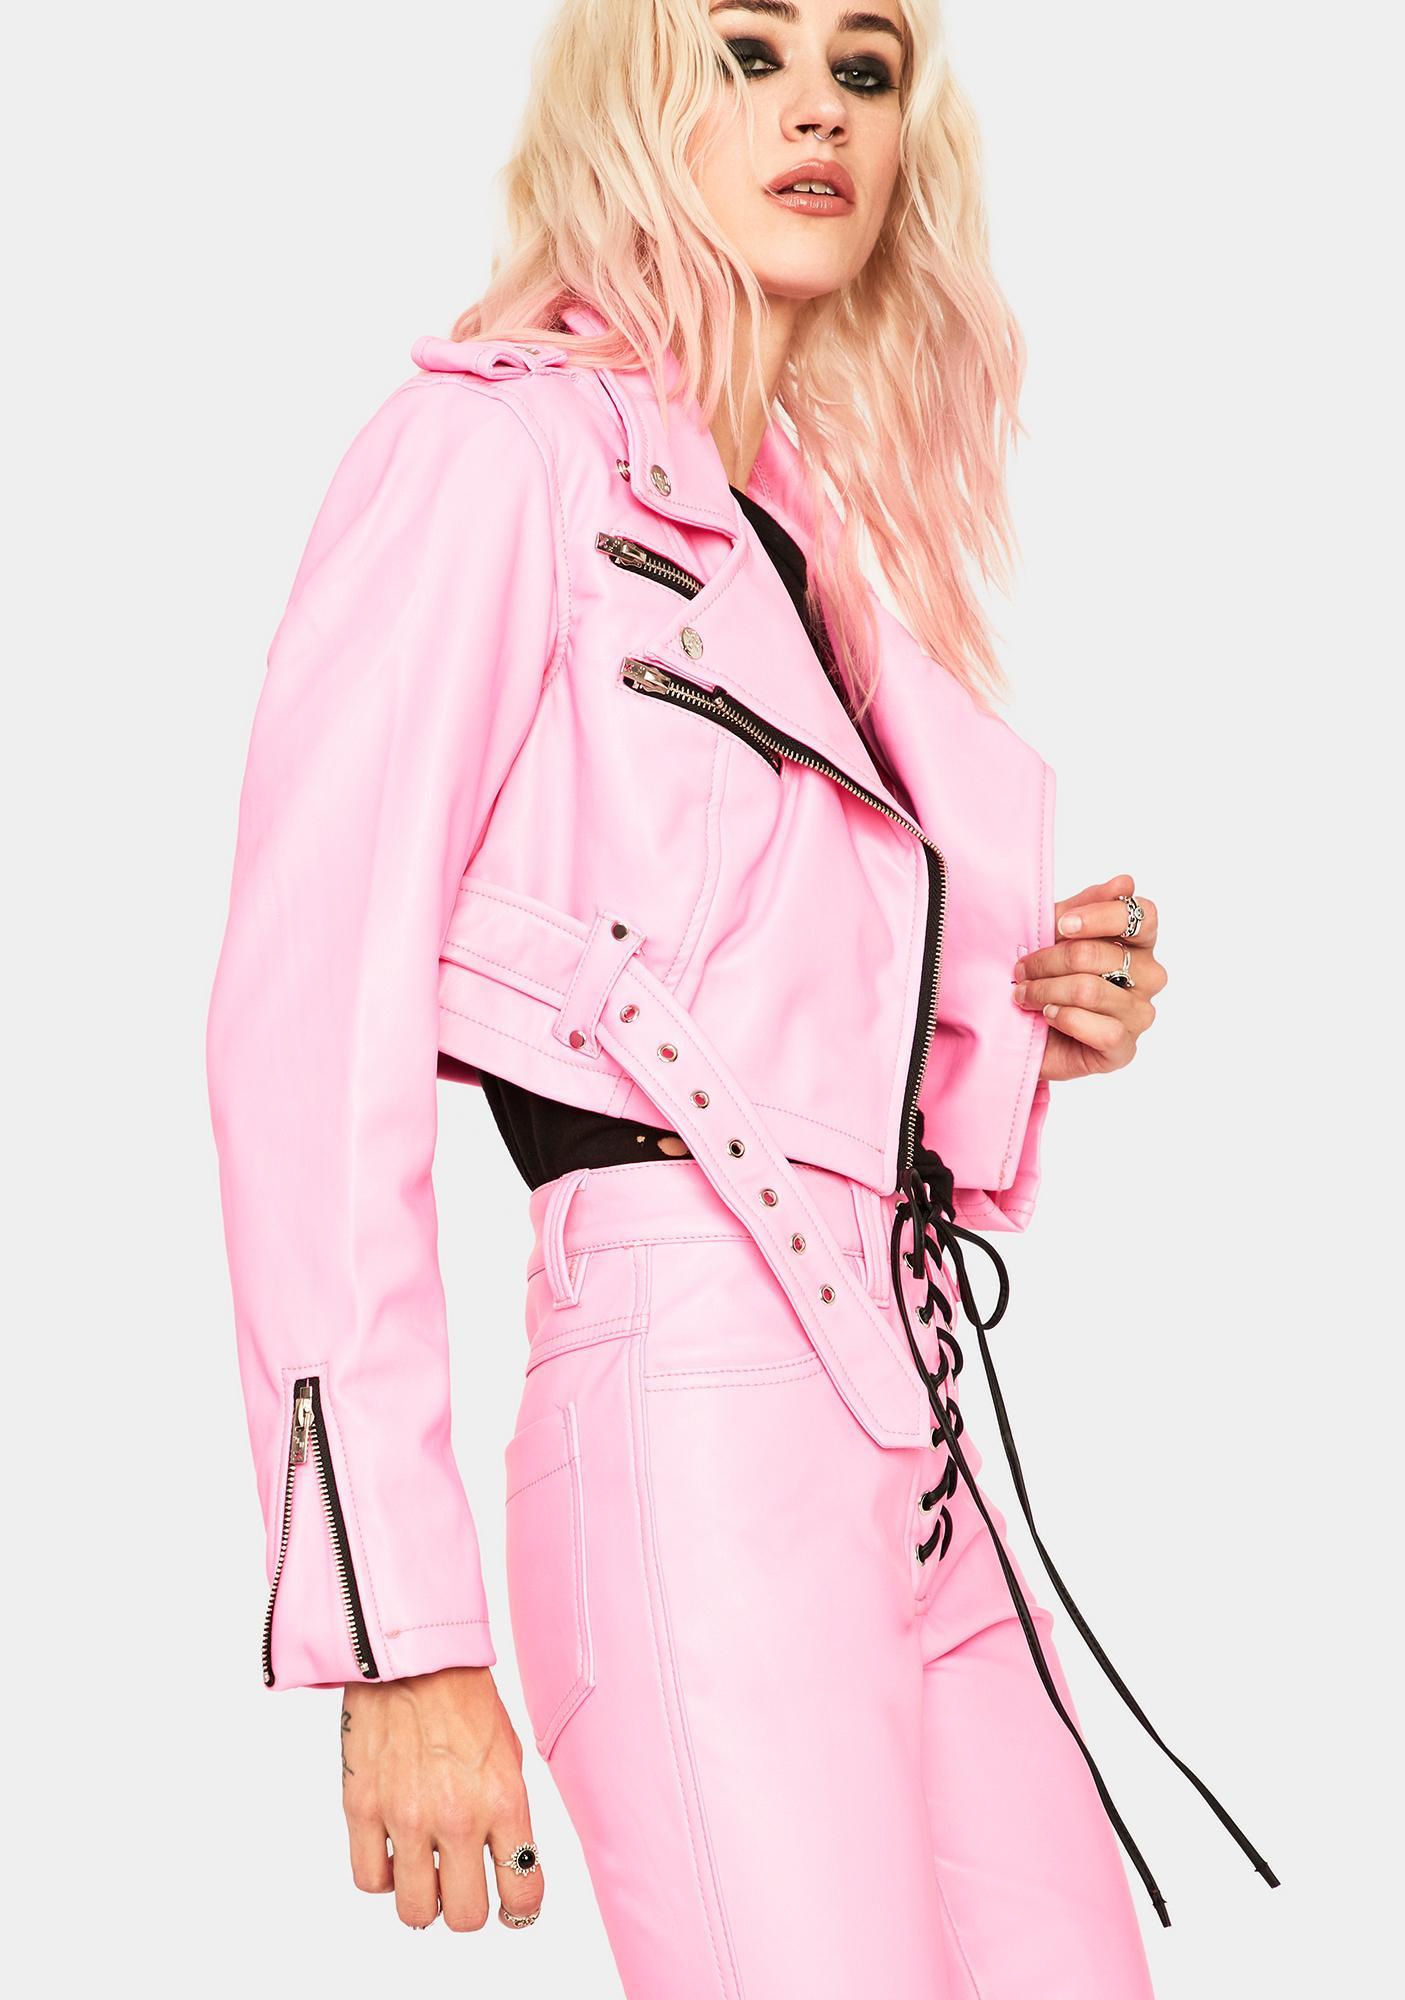 Tripp NYC Pink Cropped Moto Jacket